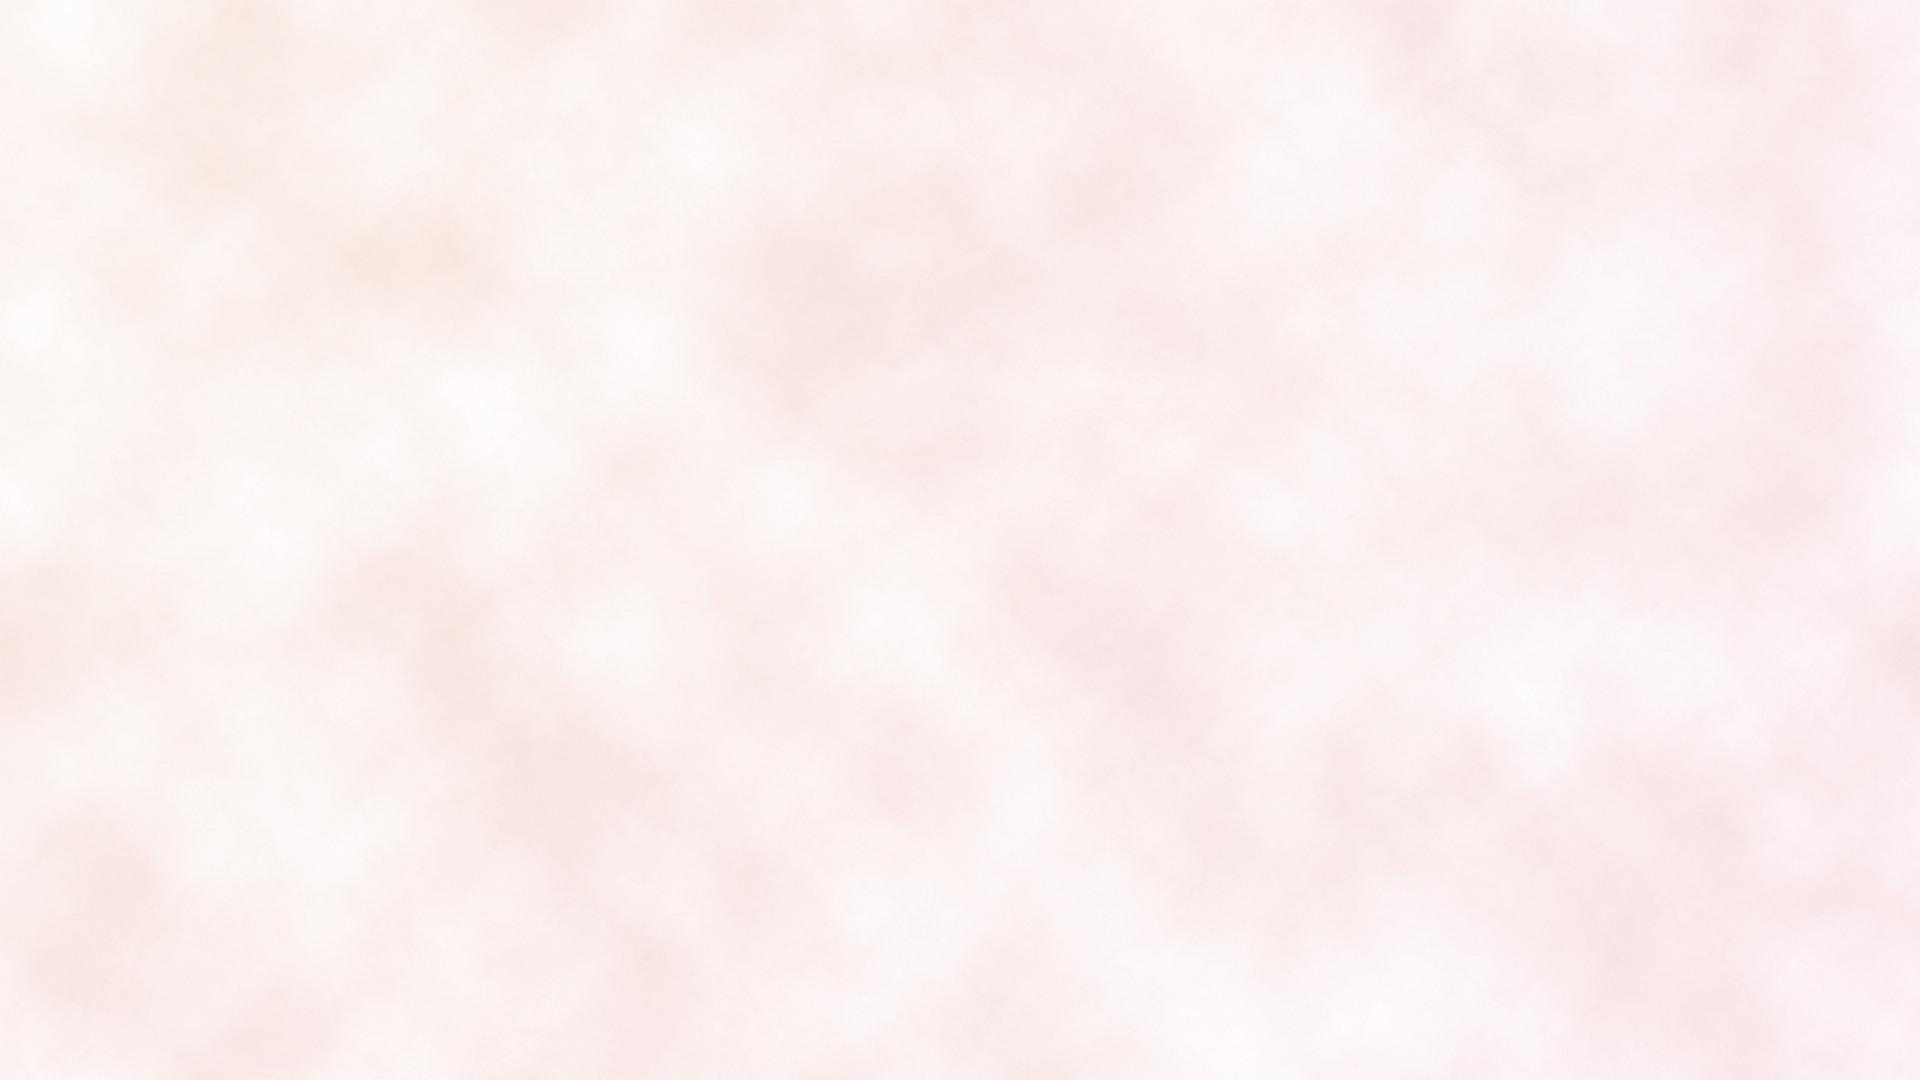 和紙風 壁紙背景画像_washi1